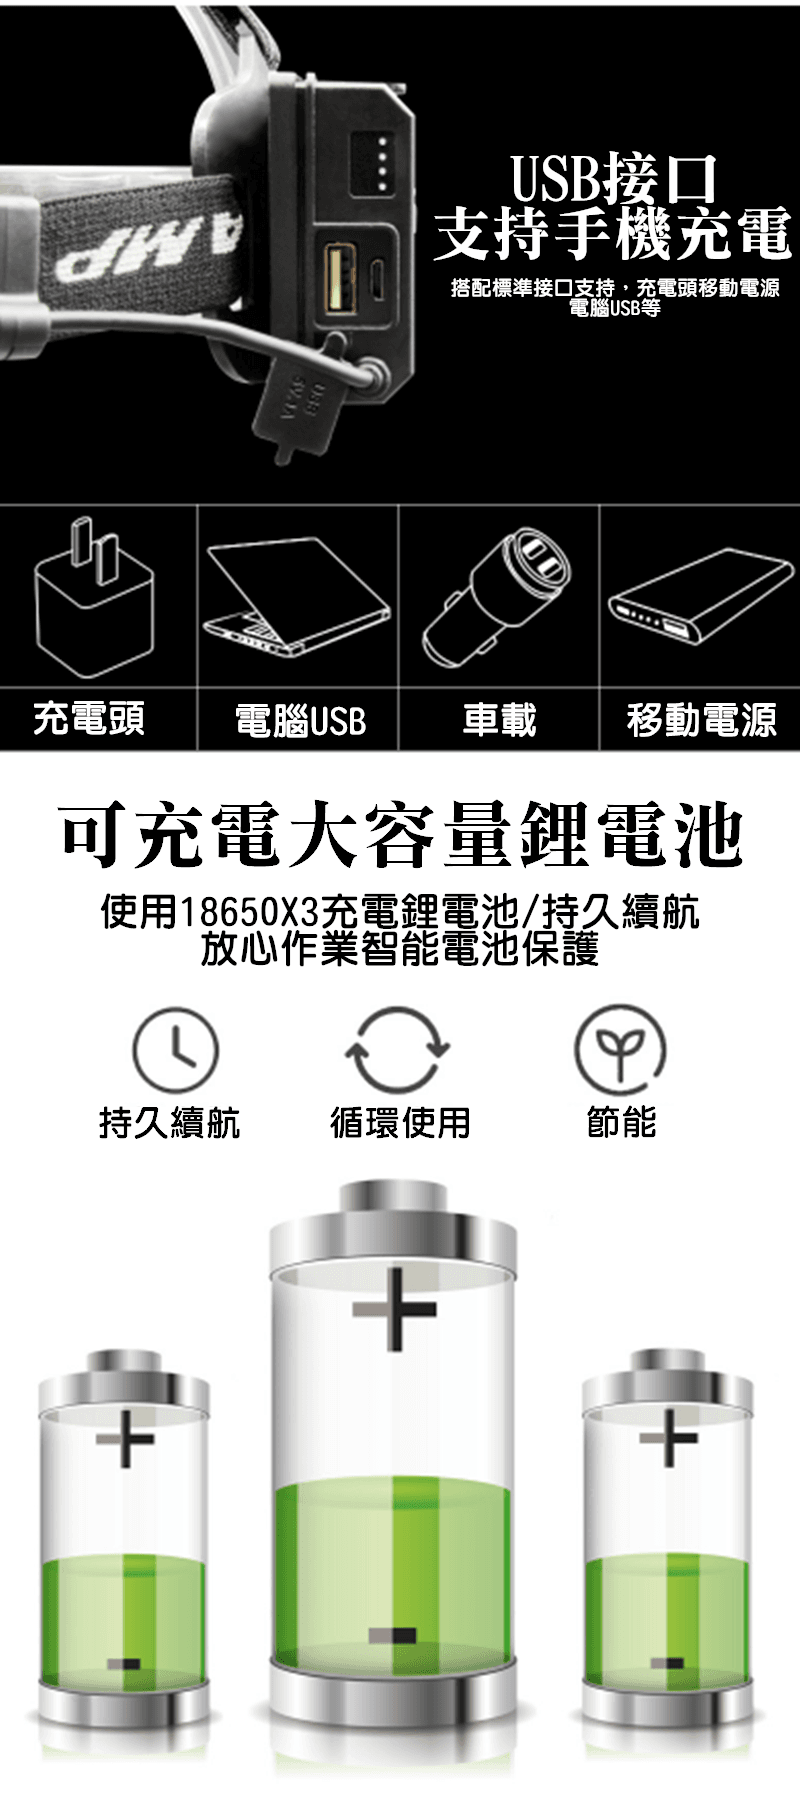 T50型變焦P70頭燈+USB線(單賣) 5